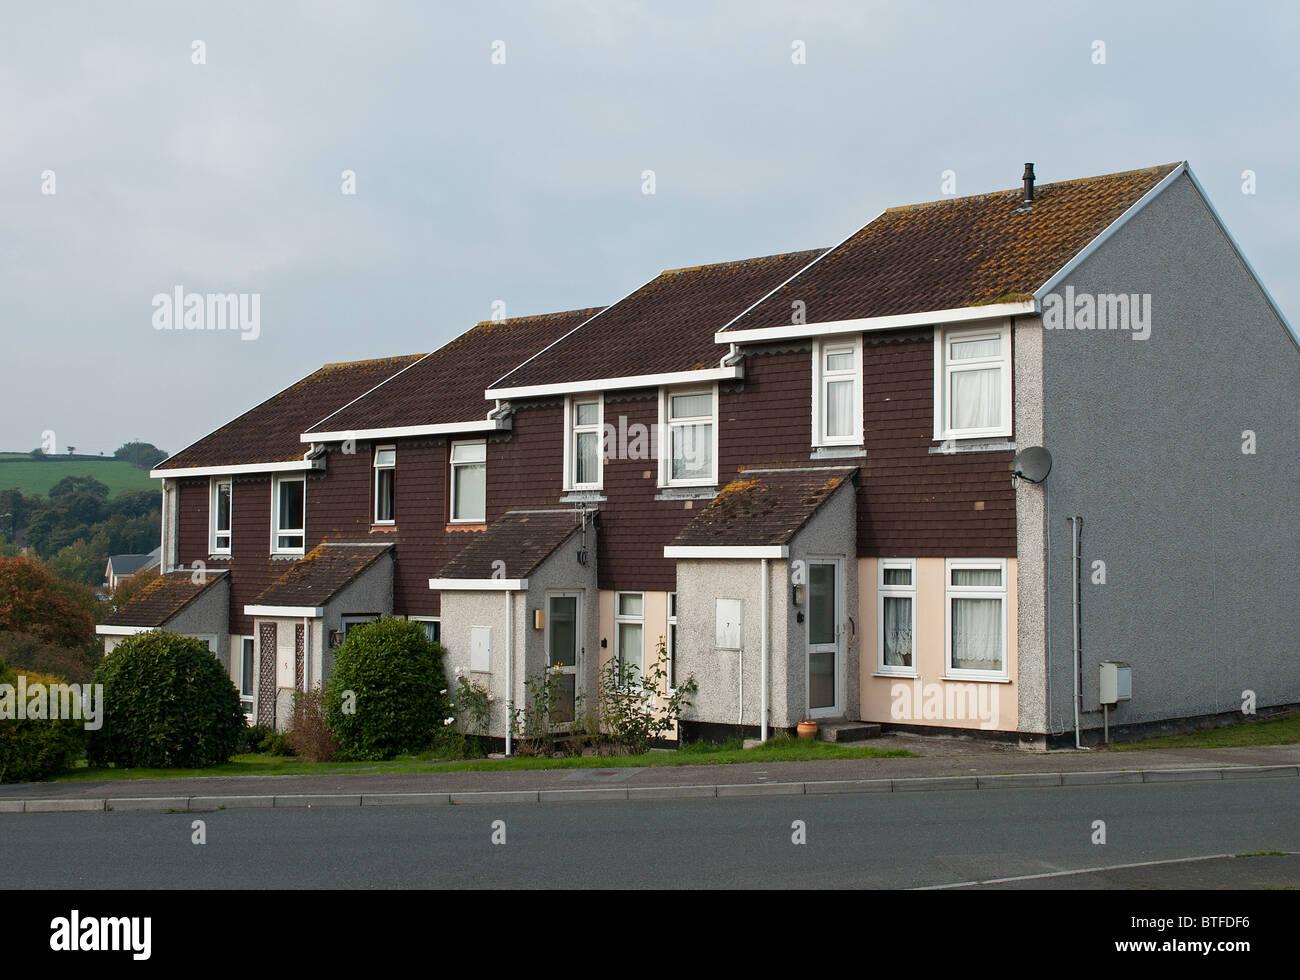 council housing in lancashire, uk - Stock Image